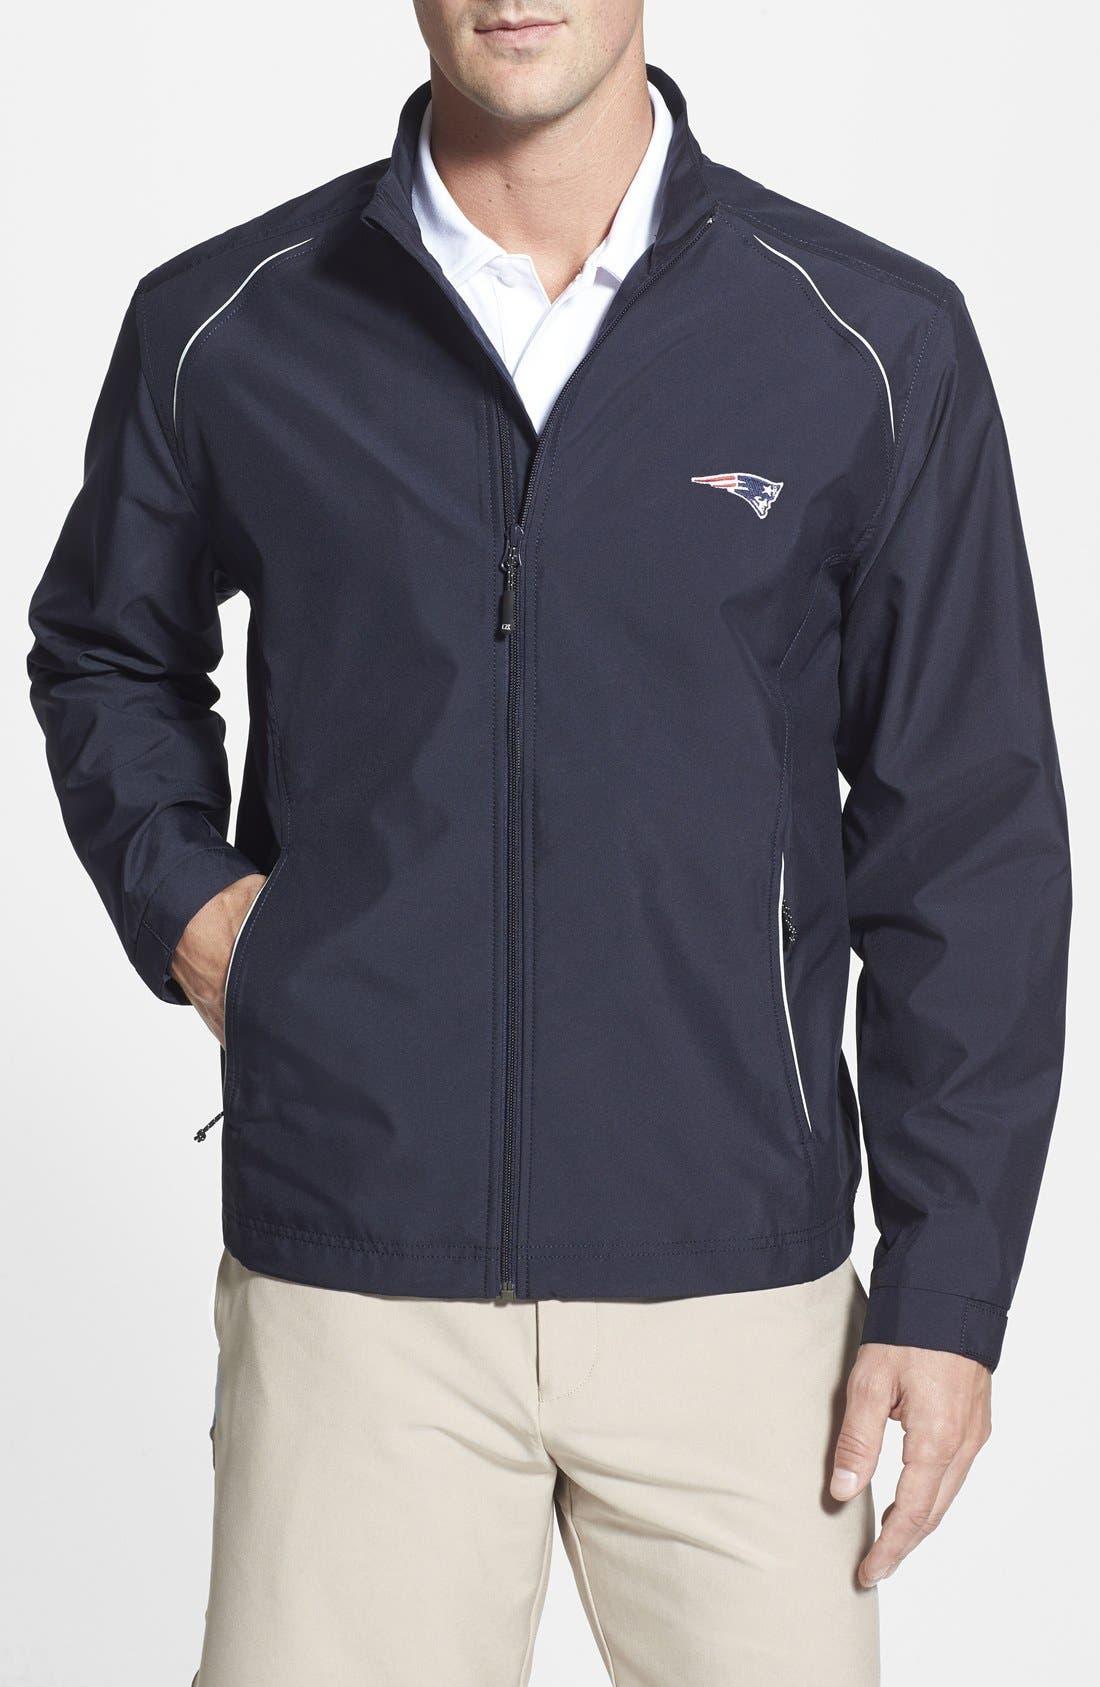 New England Patriots - Beacon WeatherTec Wind & Water Resistant Jacket,                         Main,                         color, 420